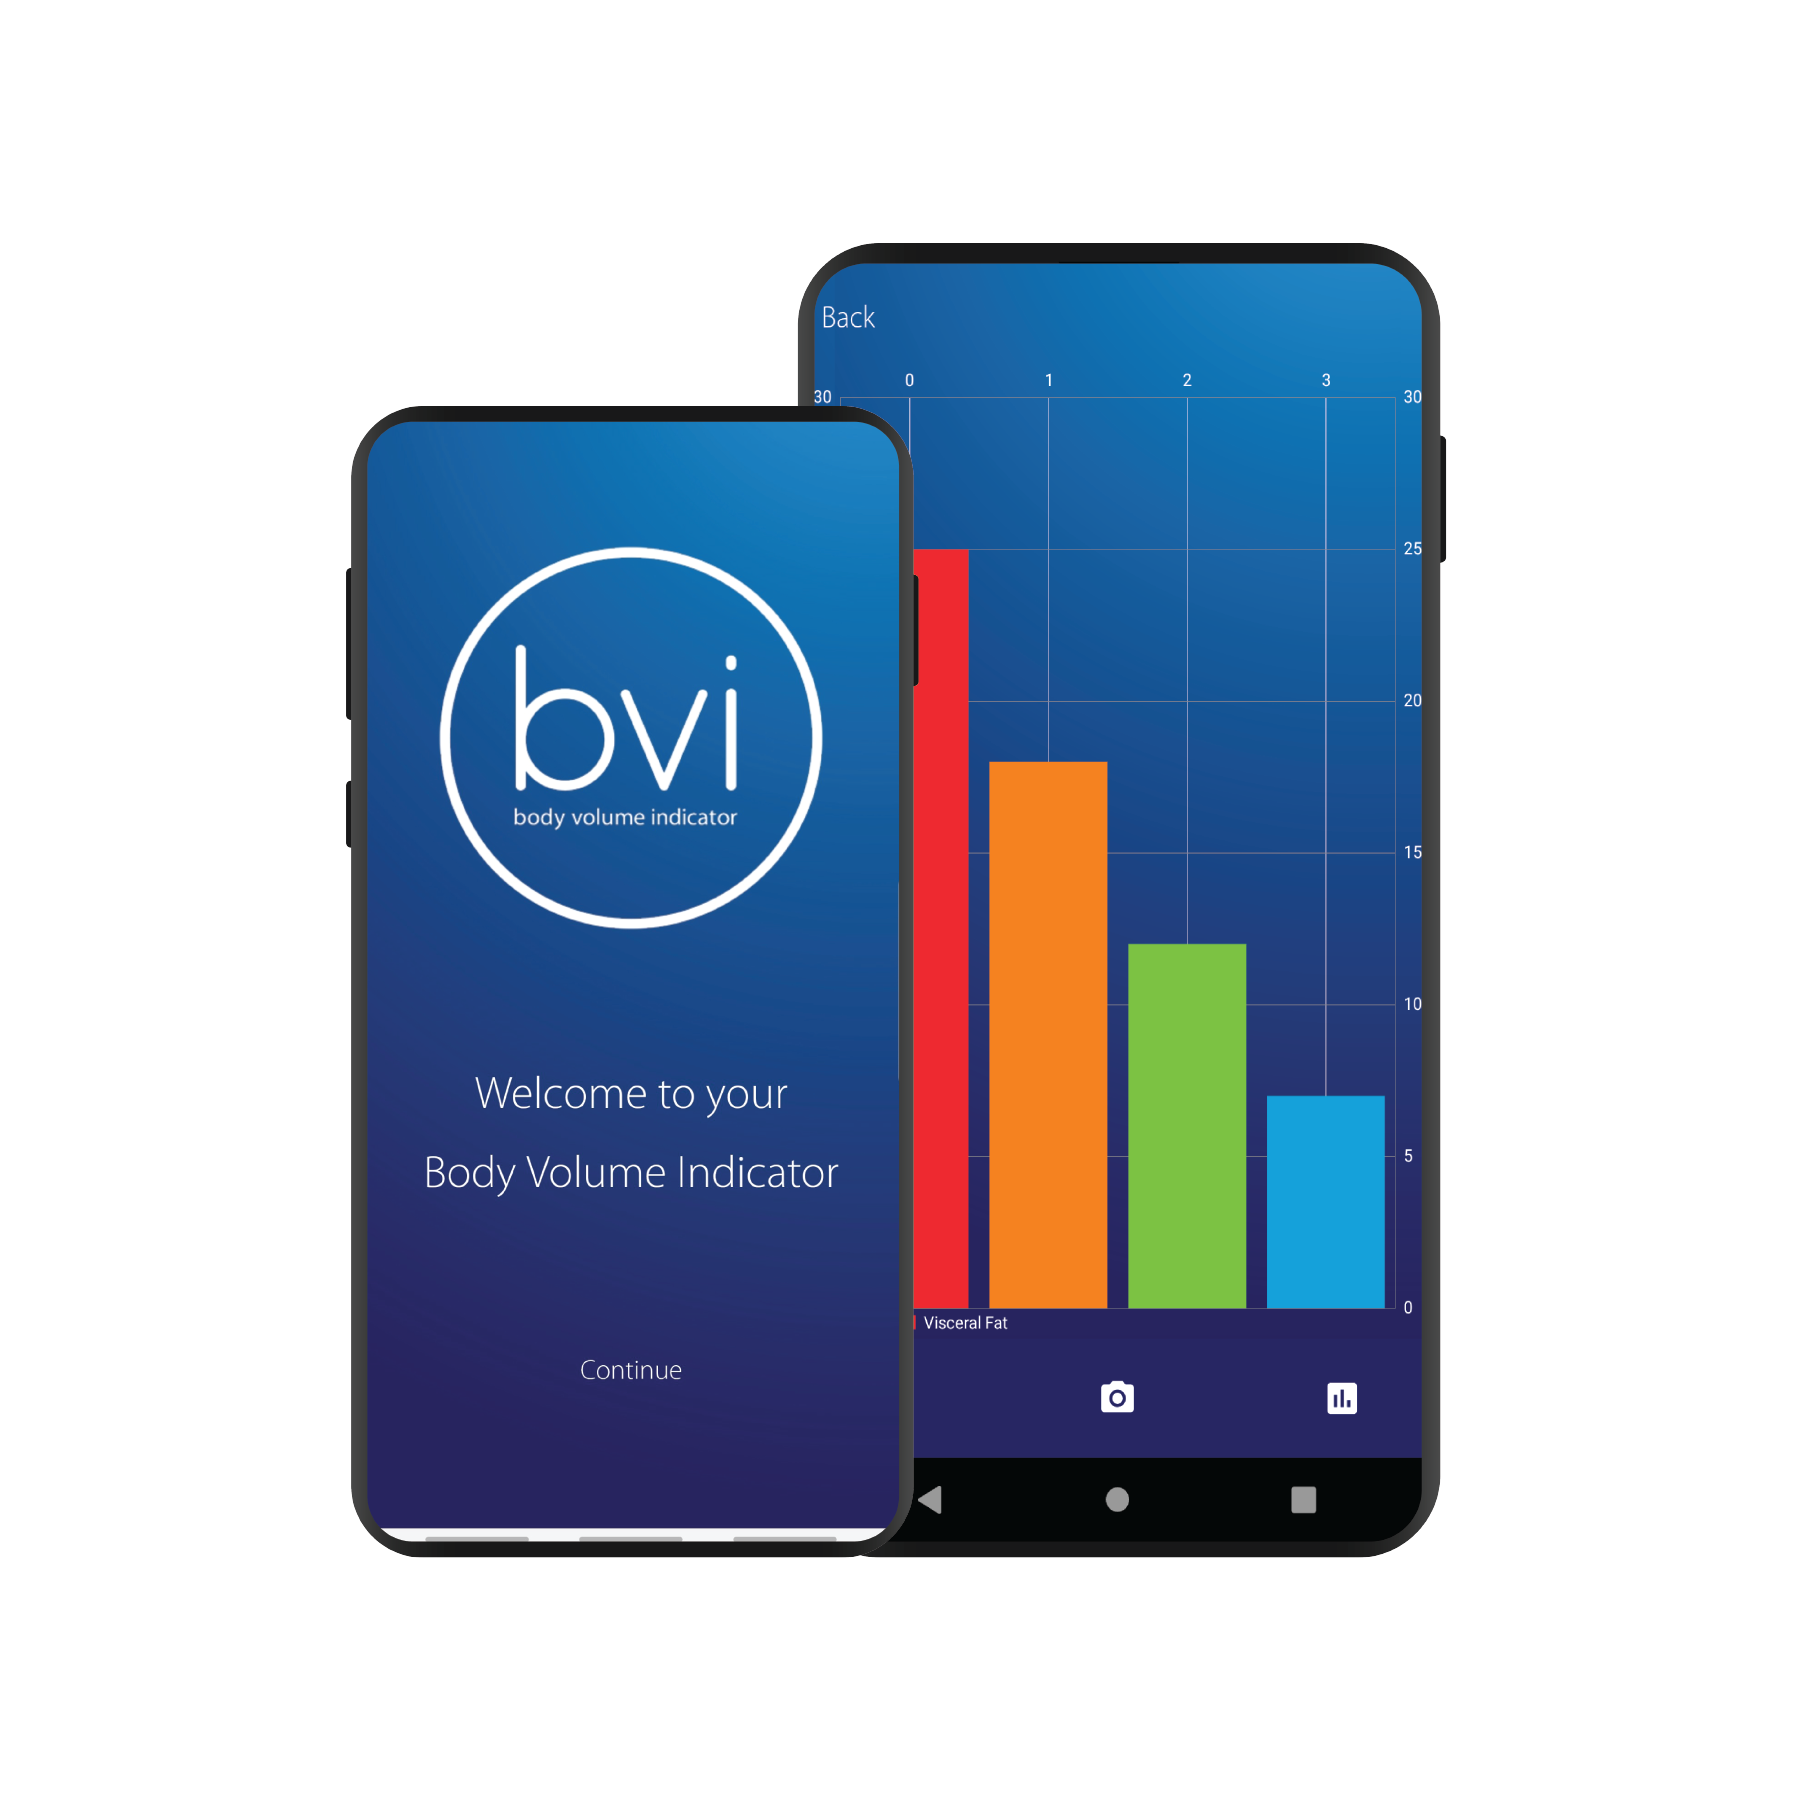 BVI Web Img 2.png